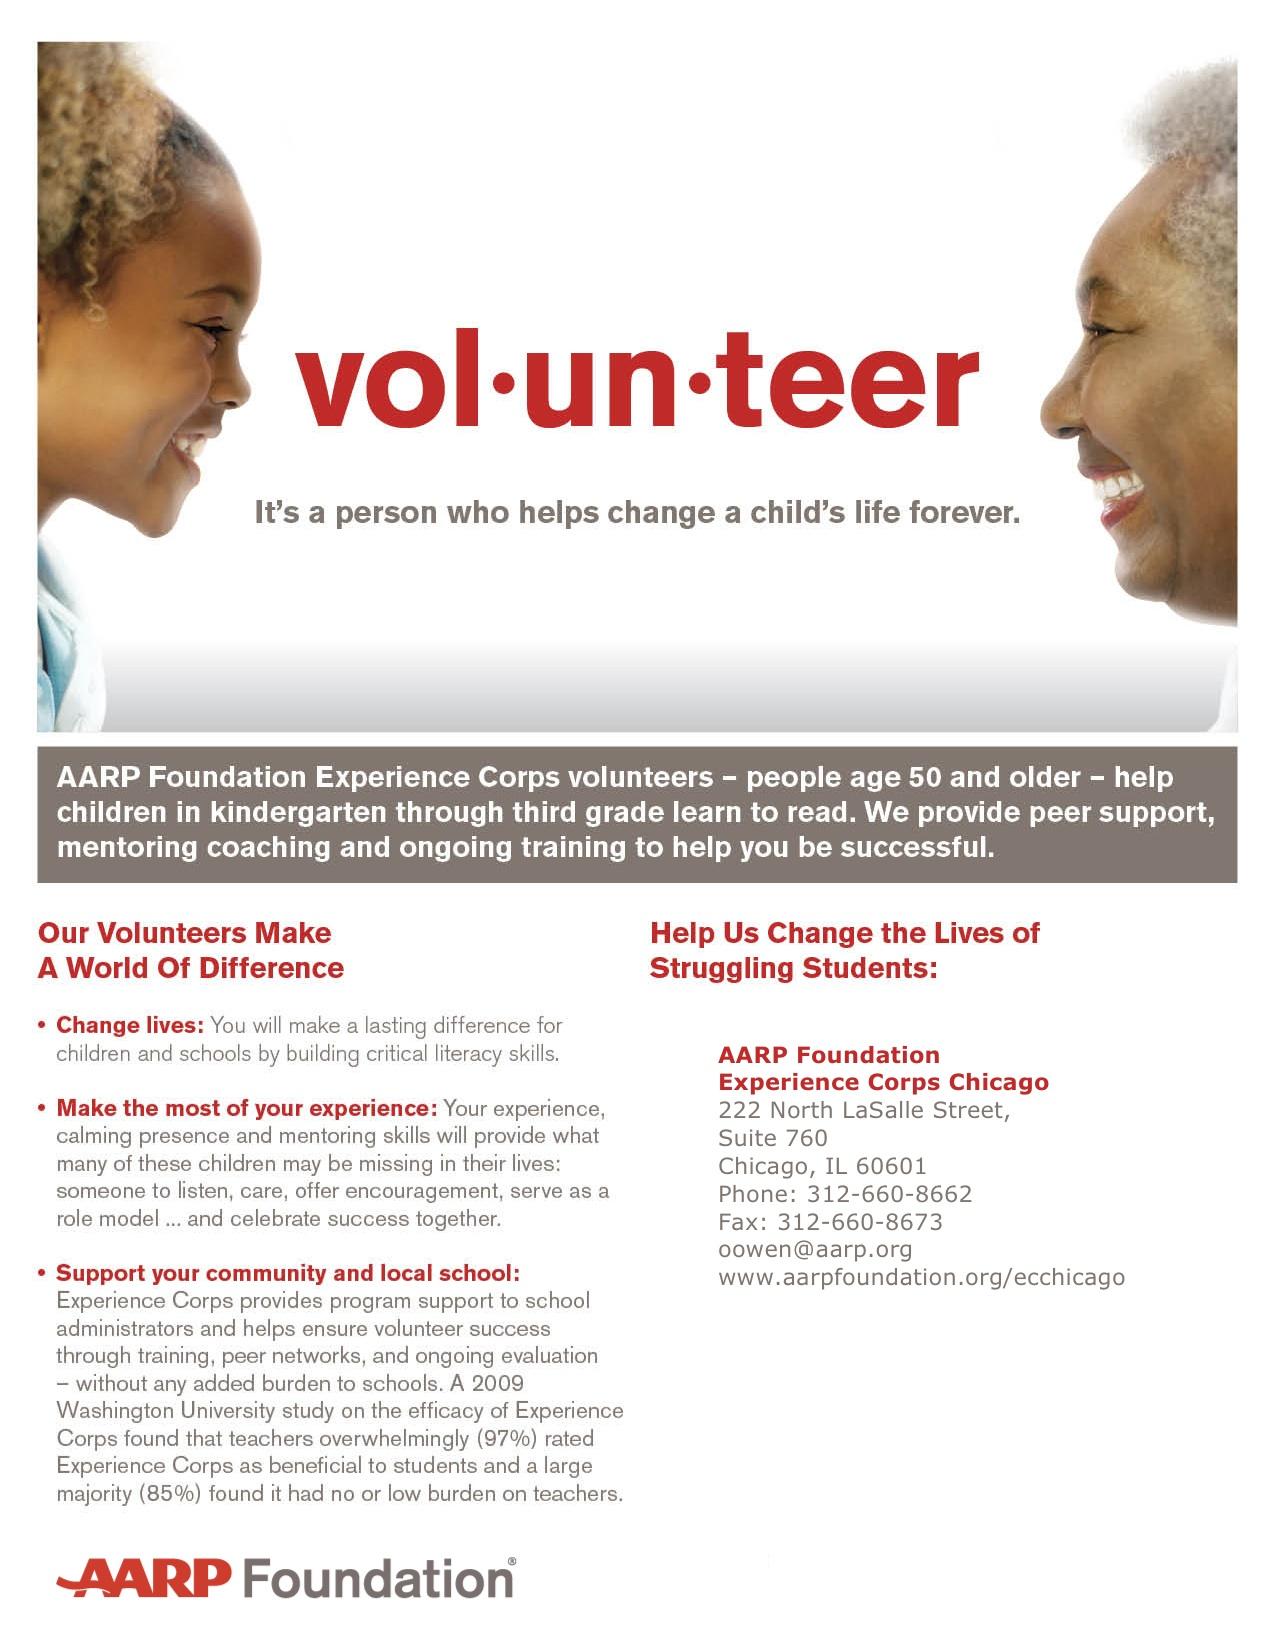 aarp foundation experience corps volunteer information session auburn gresham portal. Black Bedroom Furniture Sets. Home Design Ideas